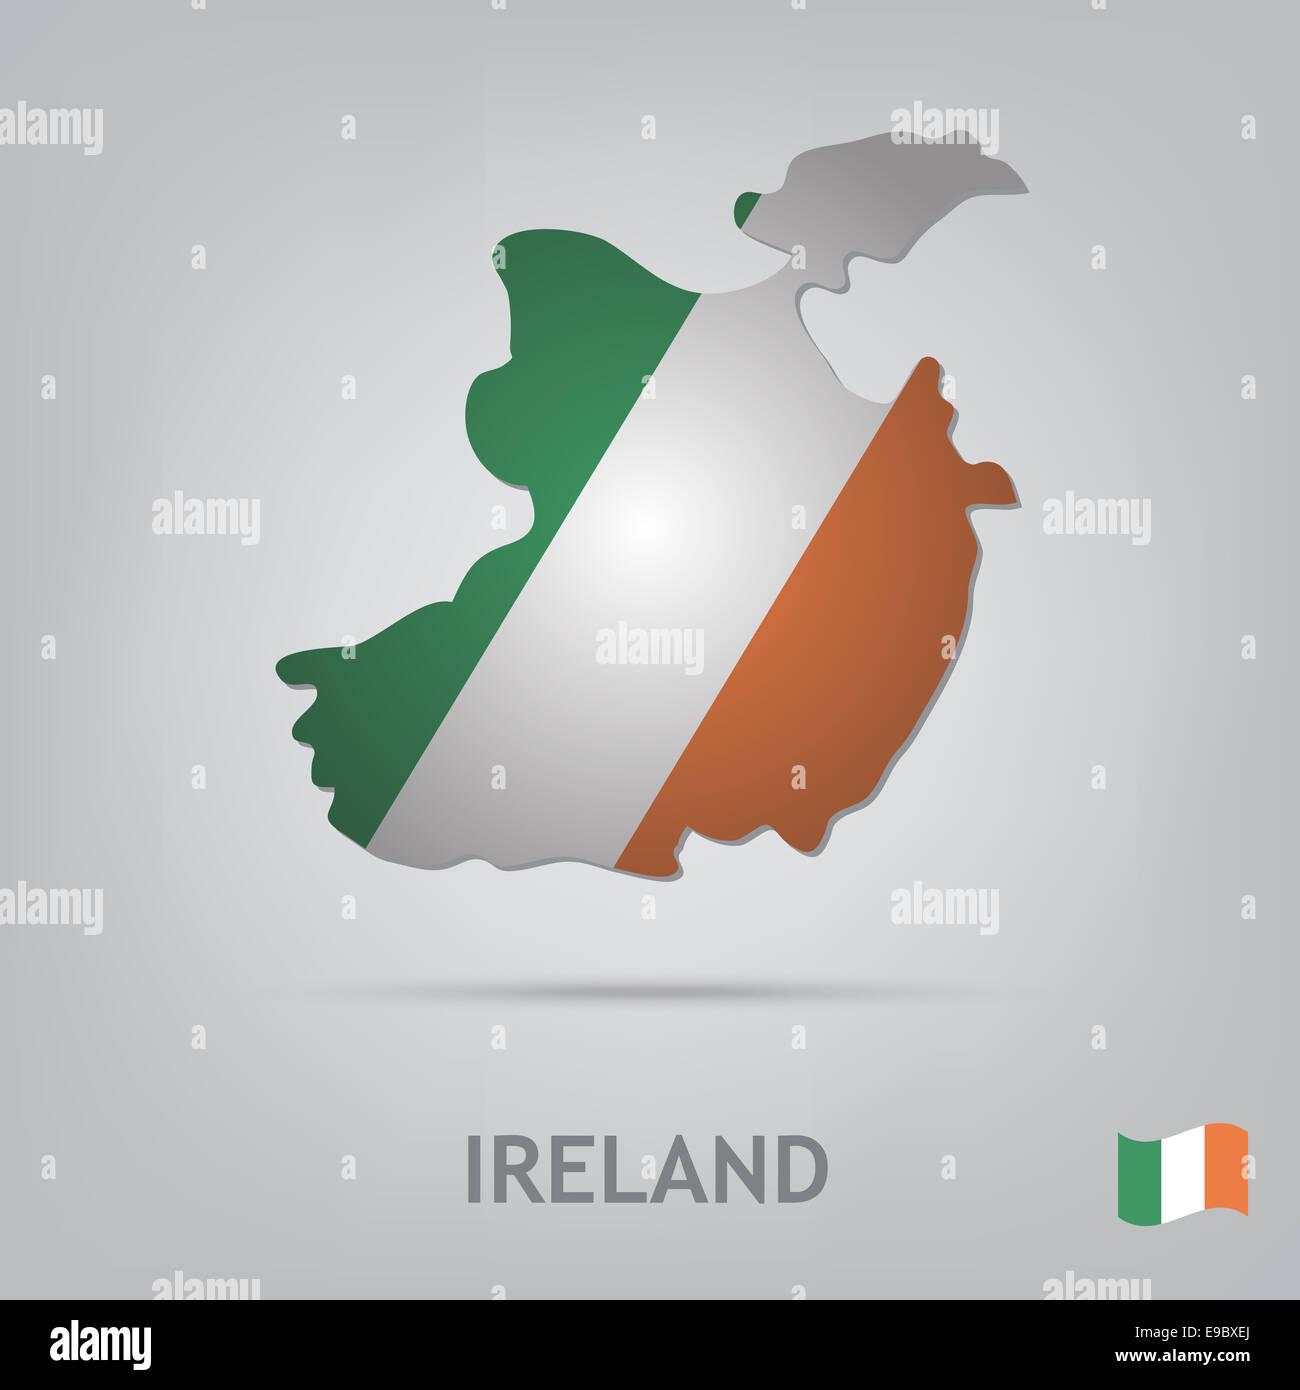 ireland - Stock Image